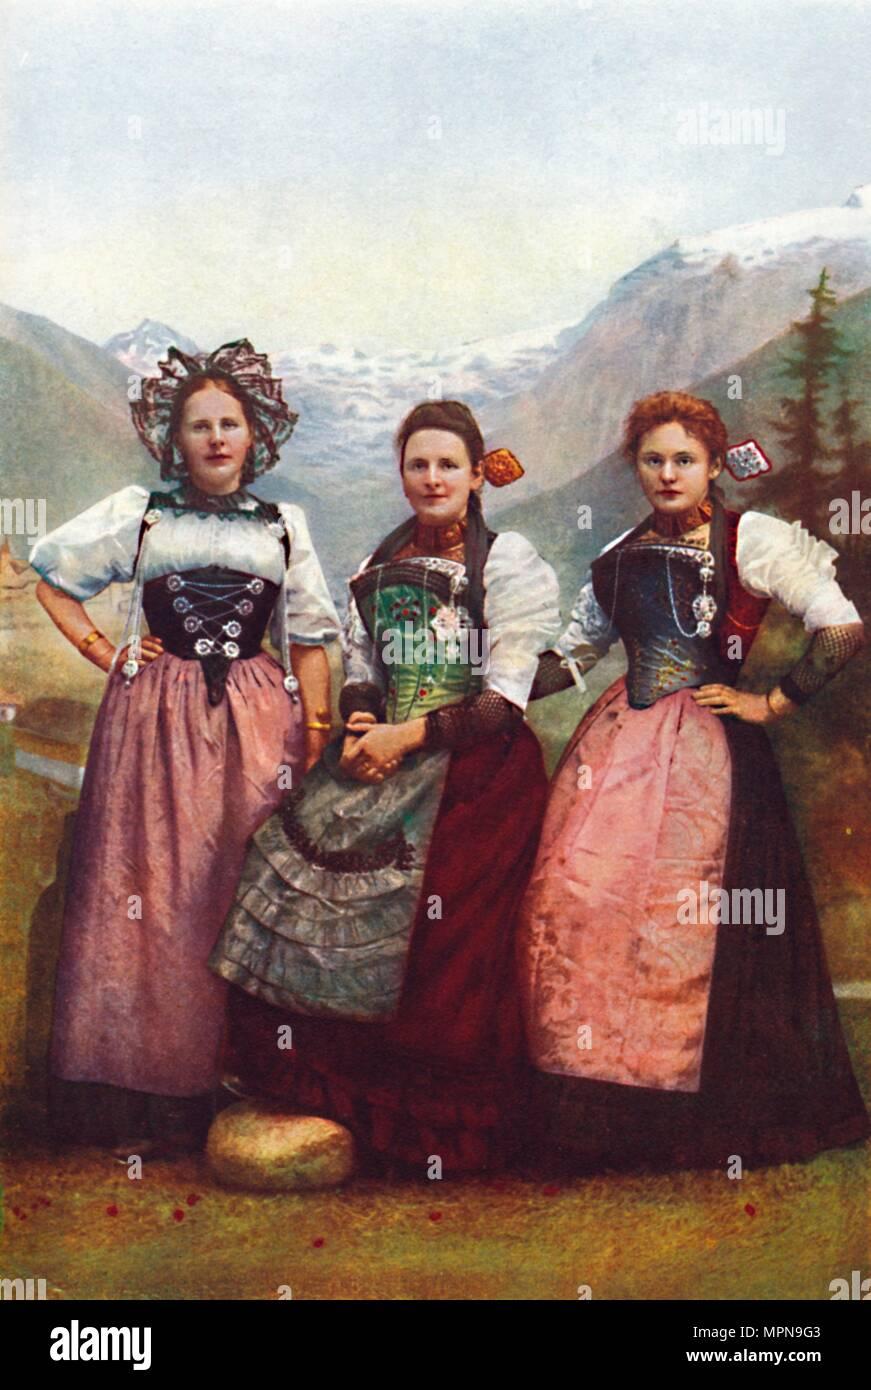 swiss girl traditional dress stock photos swiss girl traditional